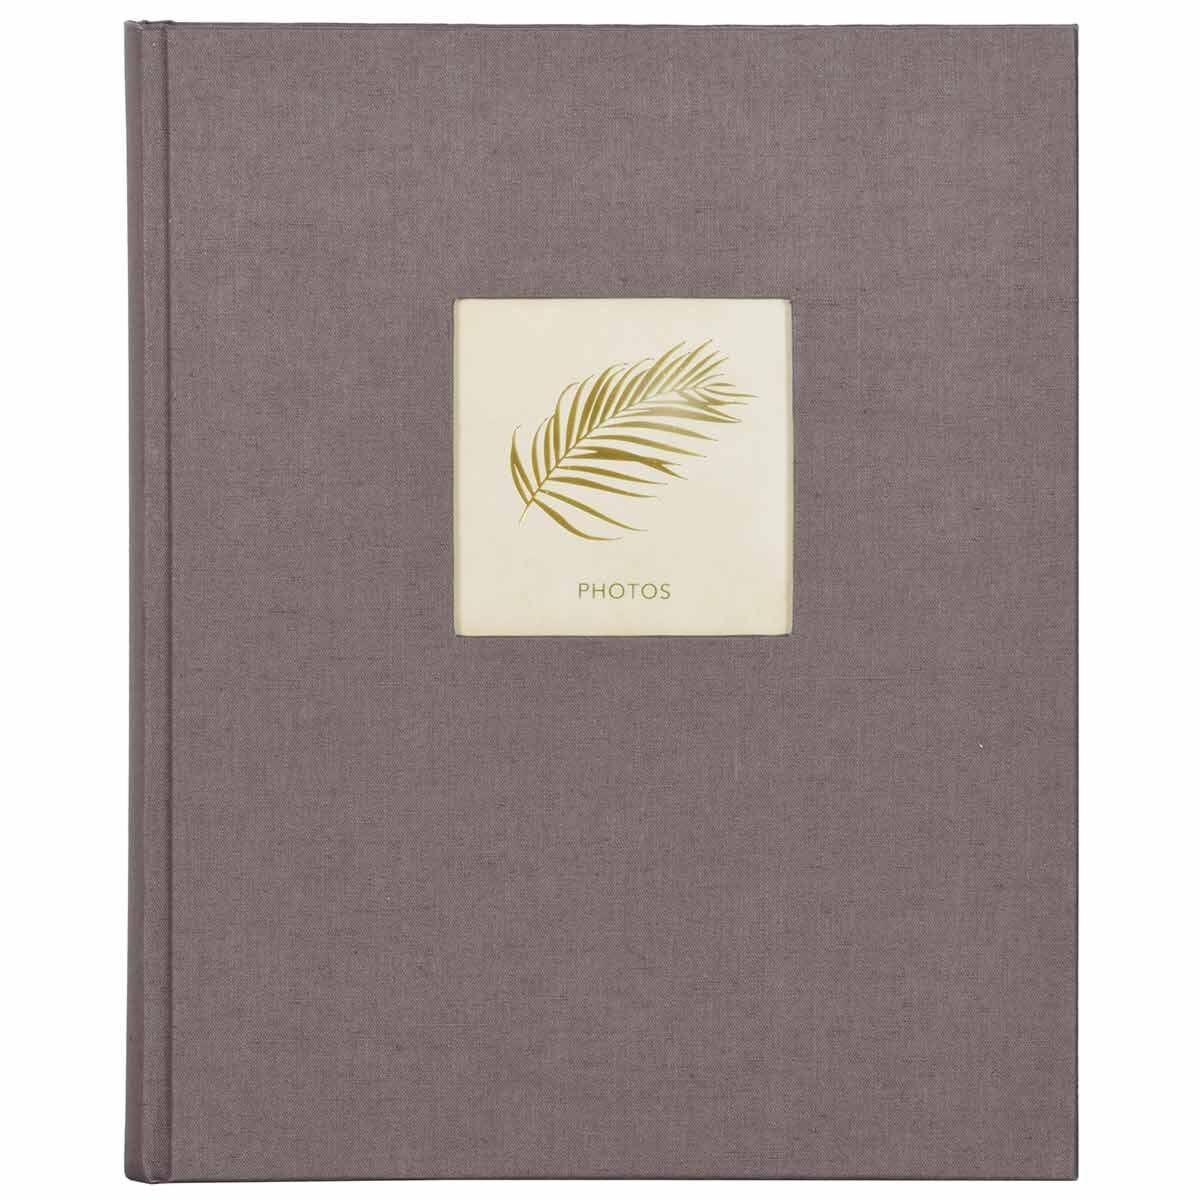 Innova Linen Self Adhesive Bookbound Photo Album 50 Pages